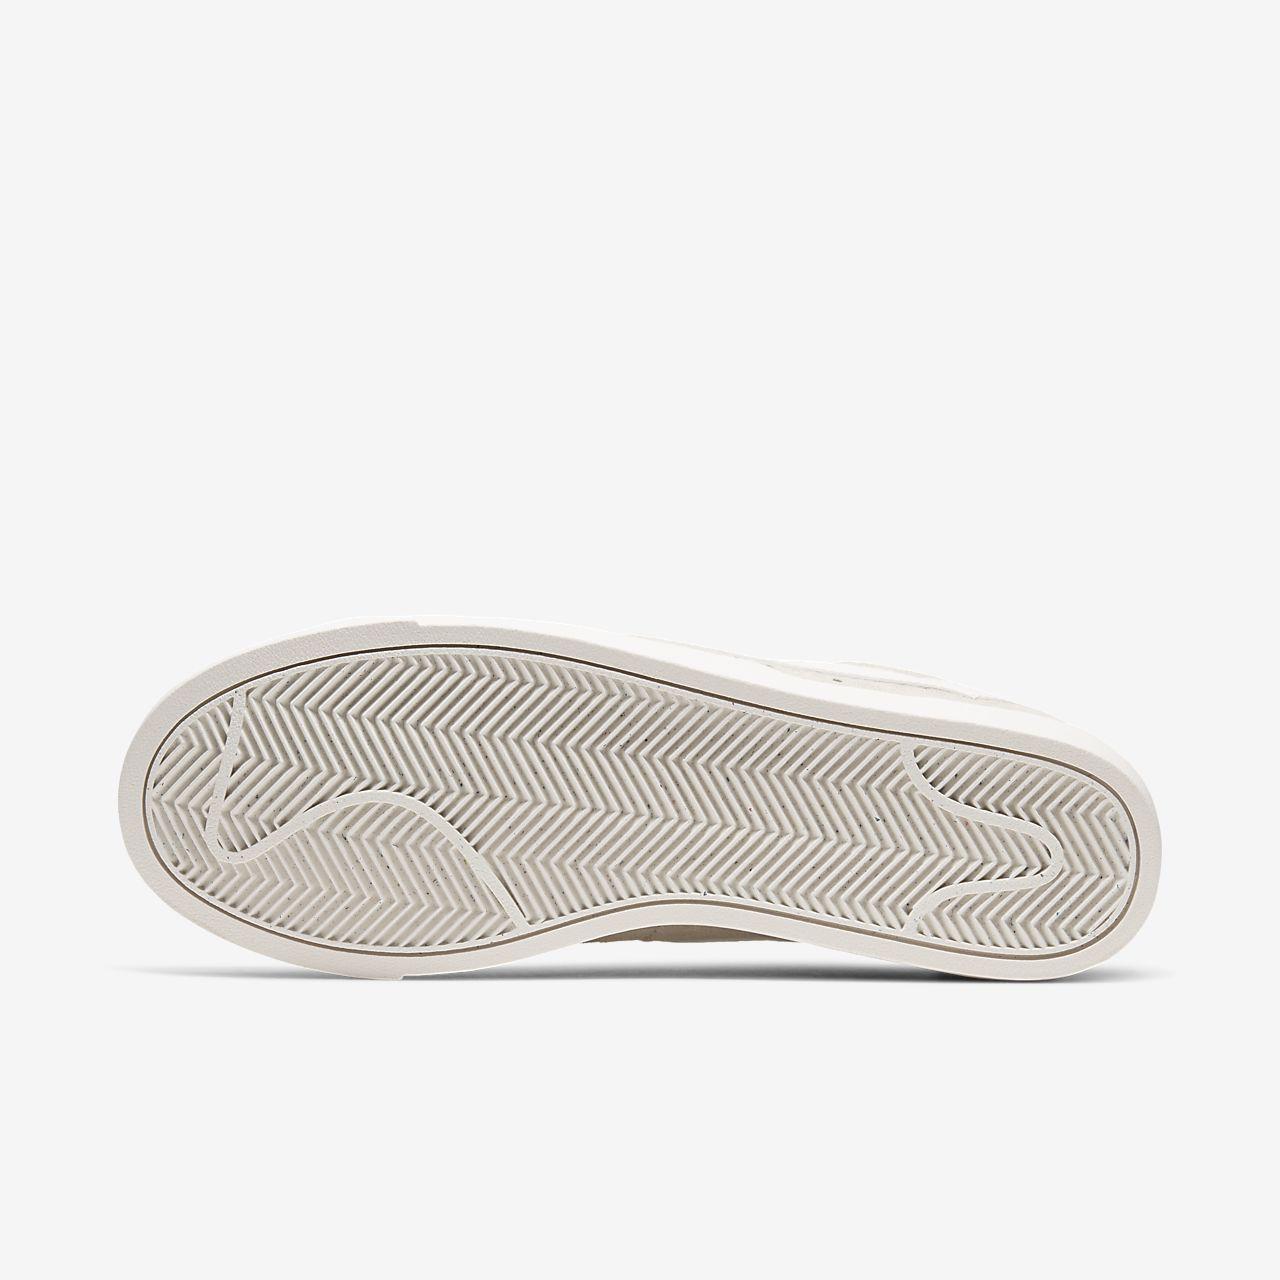 a79611d549233 Nike Blazer Low Suede Women s Shoe. Nike.com